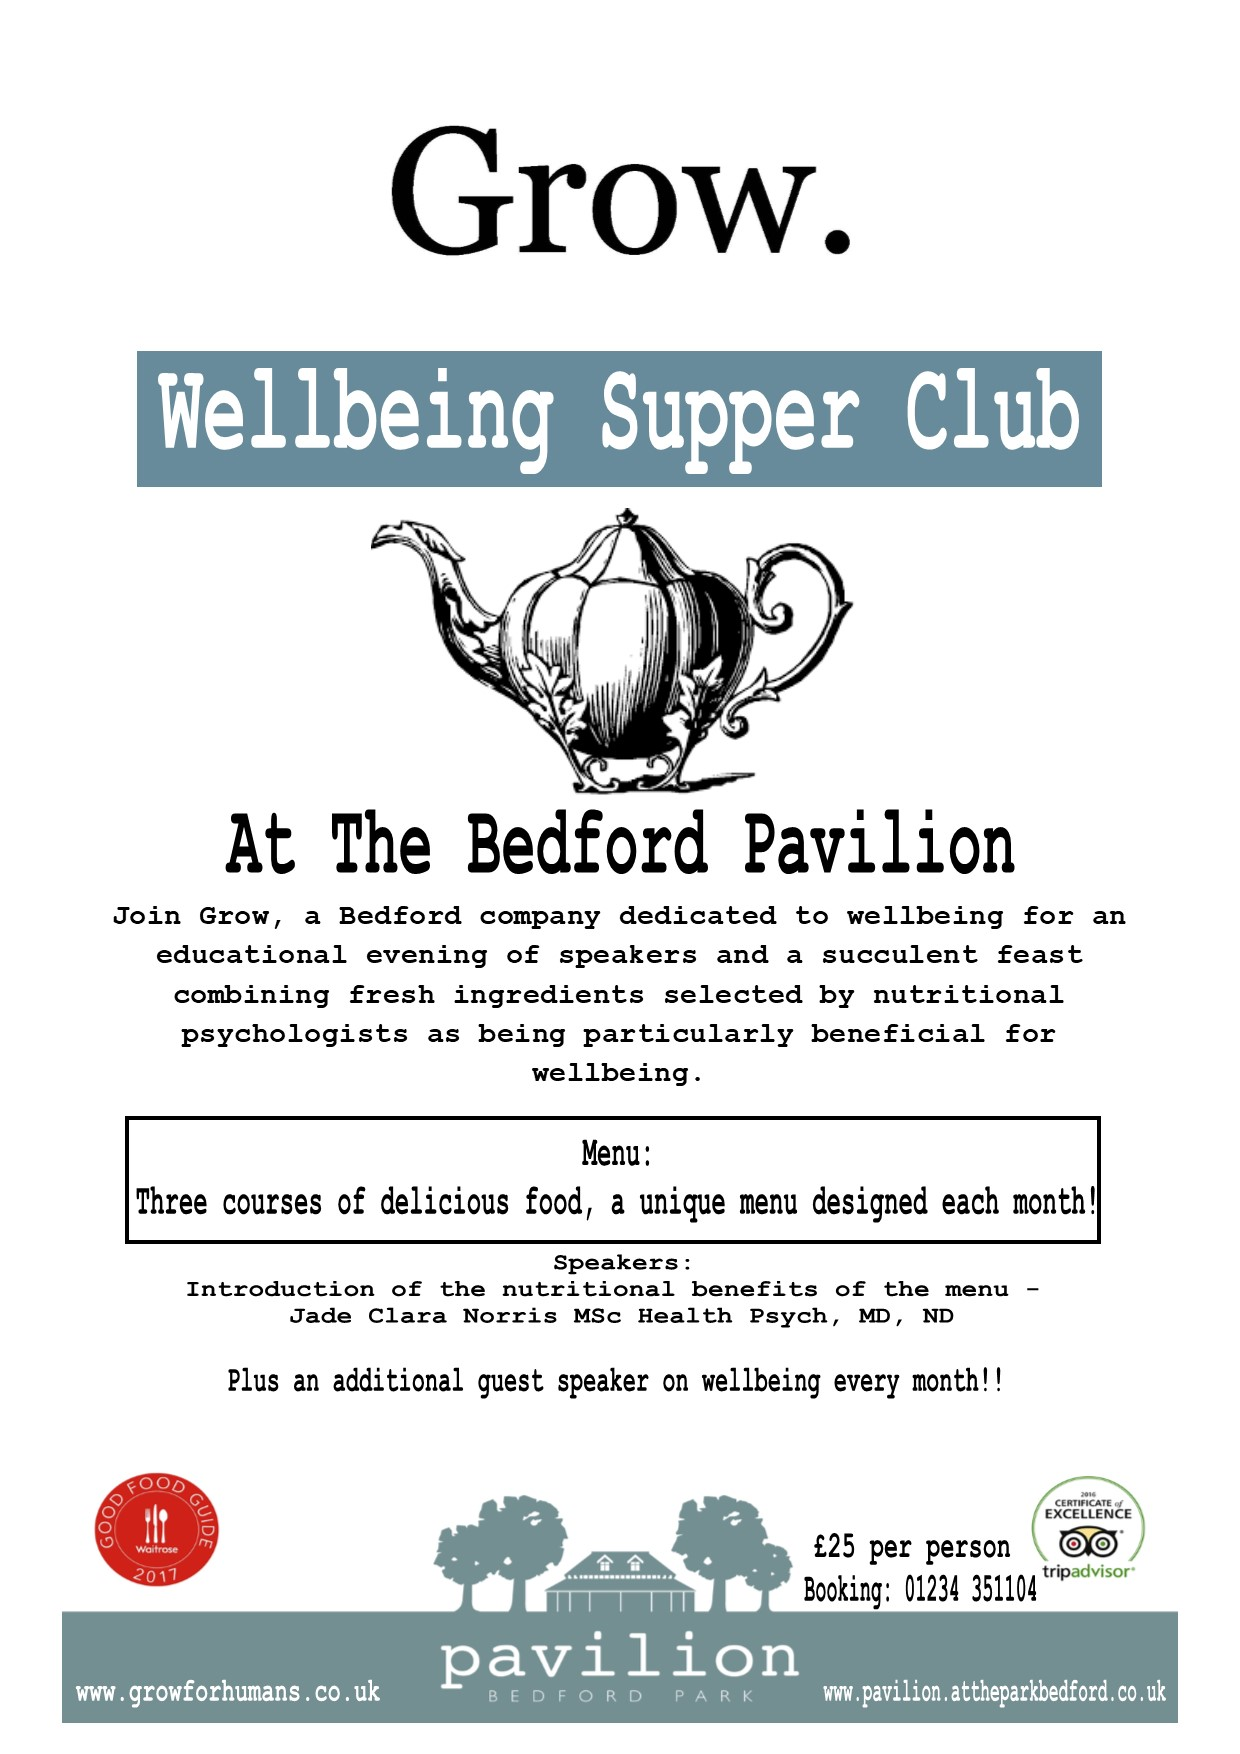 Bedford Wellbeing Supper Club